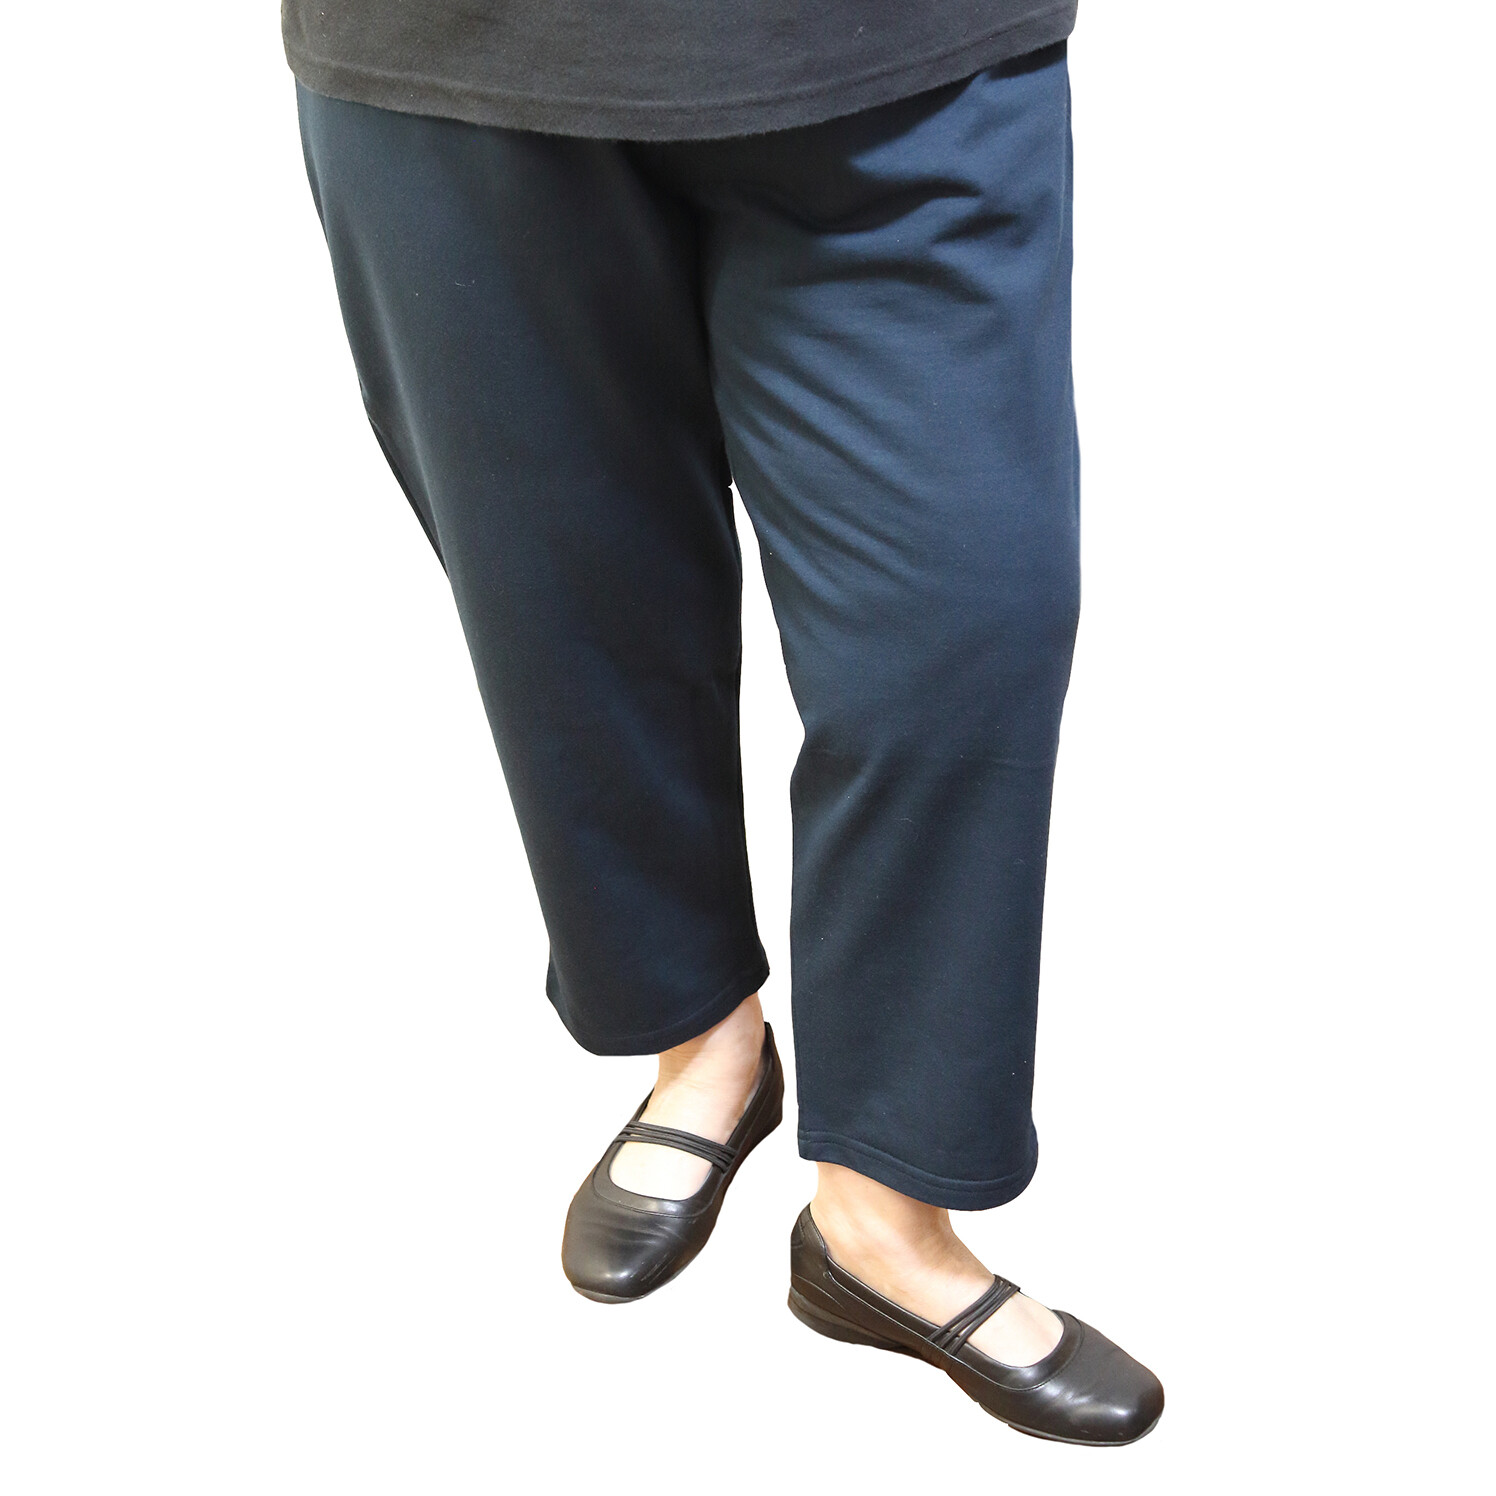 3/4 Length Pure Cotton Knit Loose Leggings